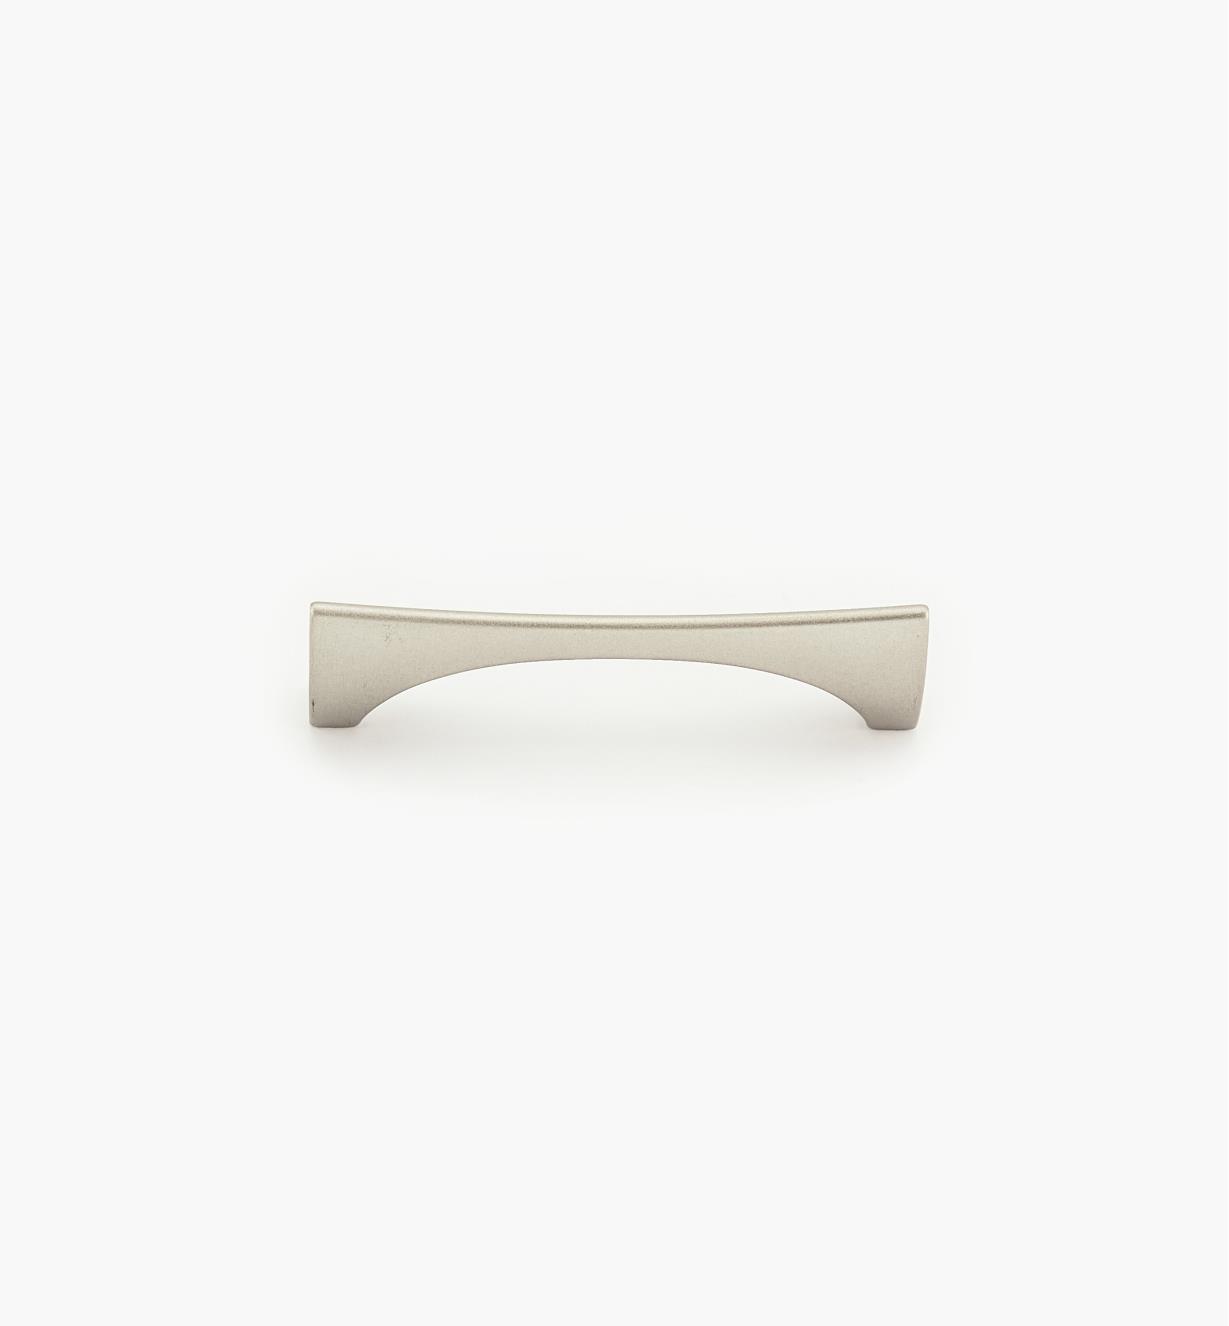 02W3910 - Poignée Niteroi, fini palladium, 96 mm